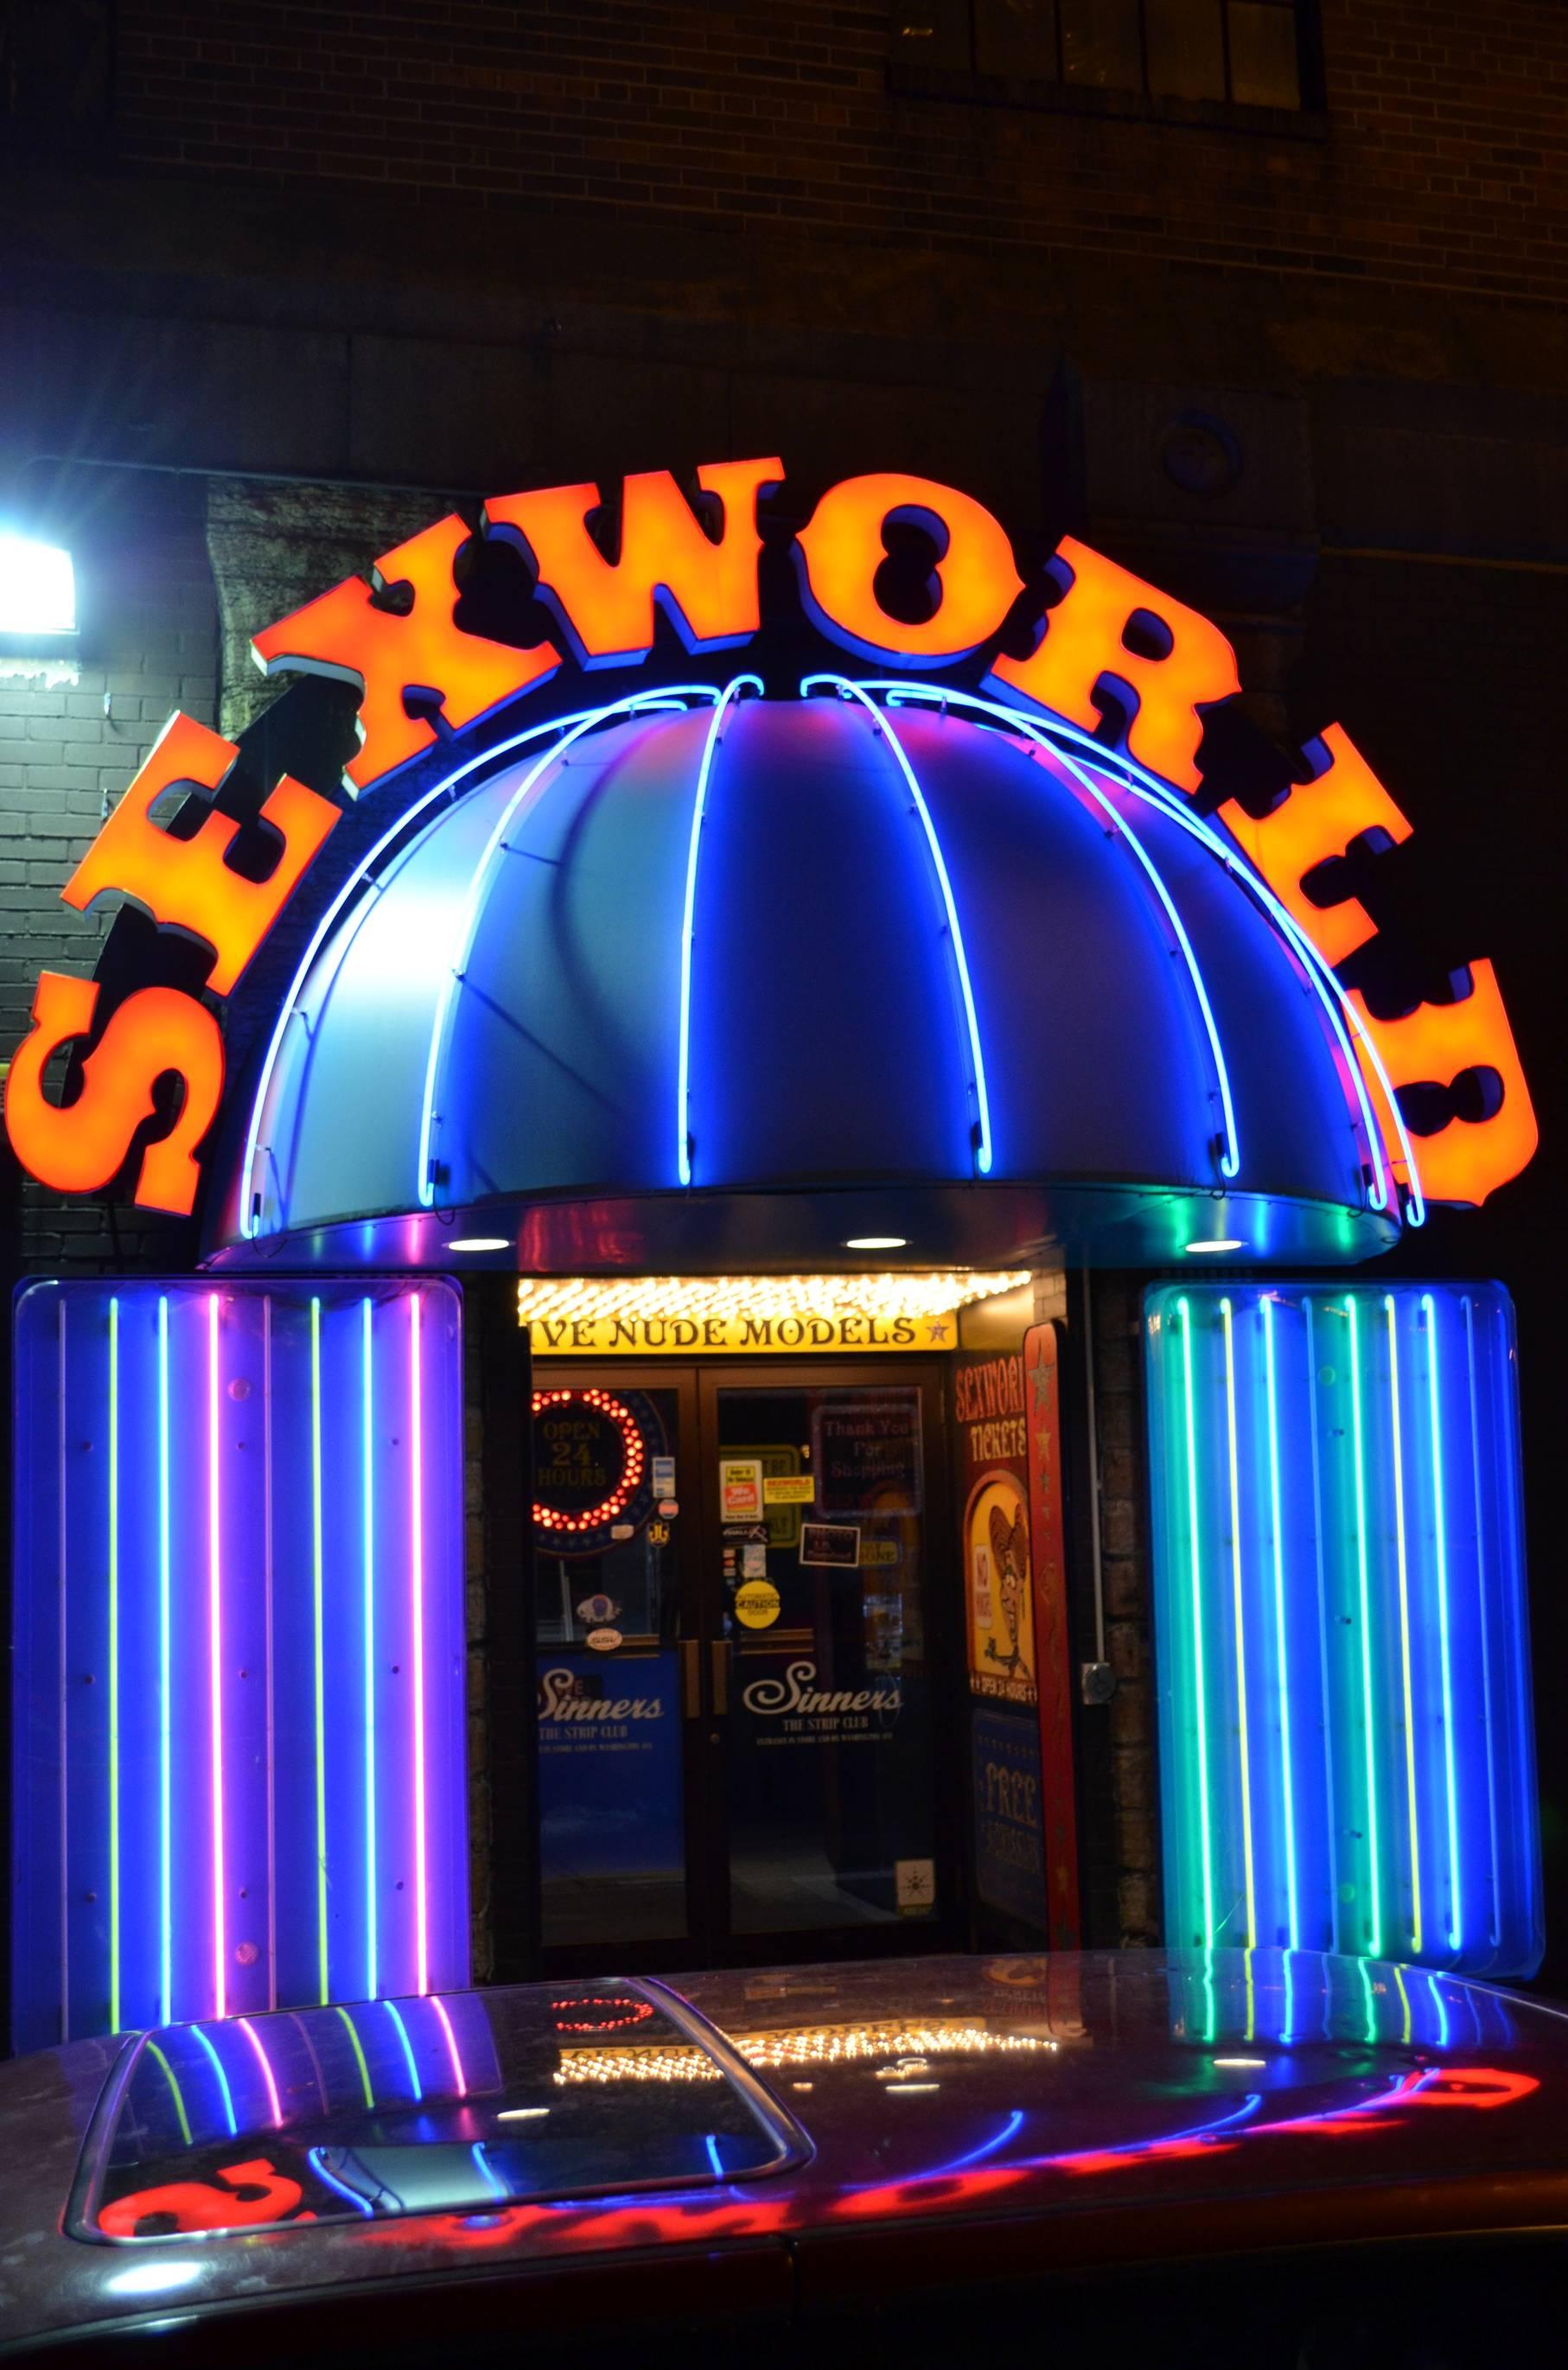 Sex world store in minnesota